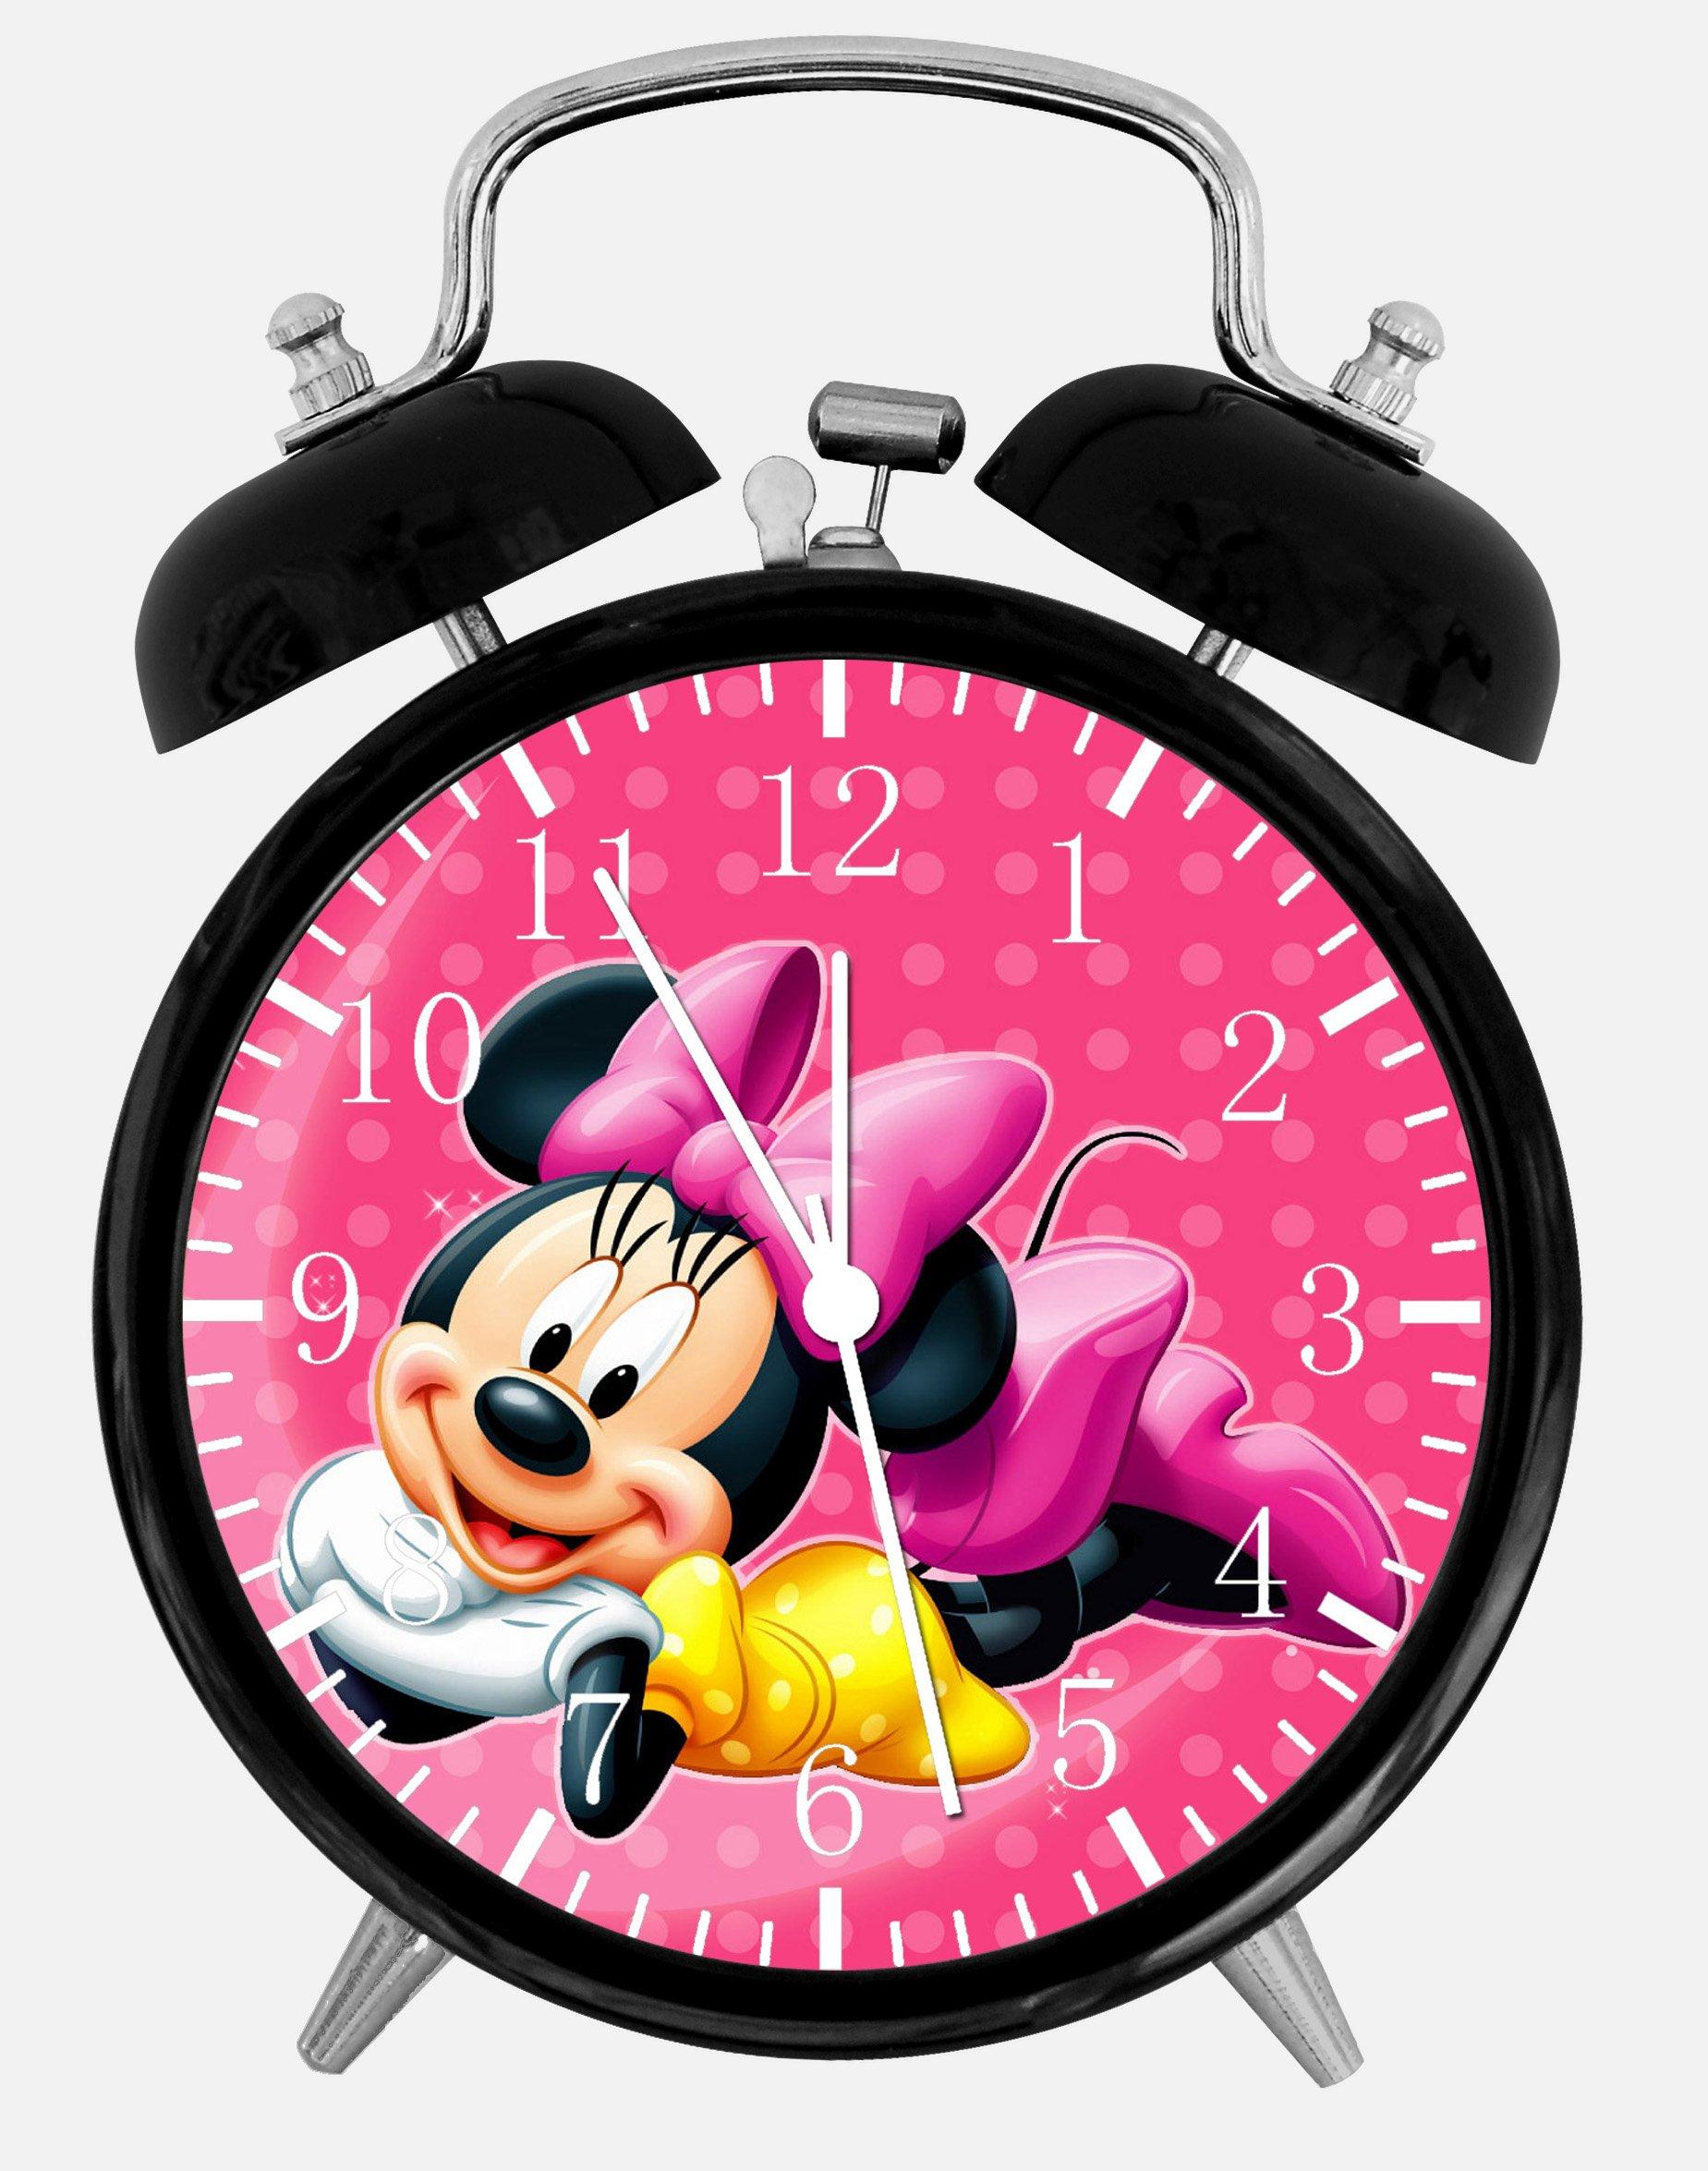 Disney Minnie Mouse Alarm Desk Clock 3.75'' Home or Office Decor E123 Nice For Gift